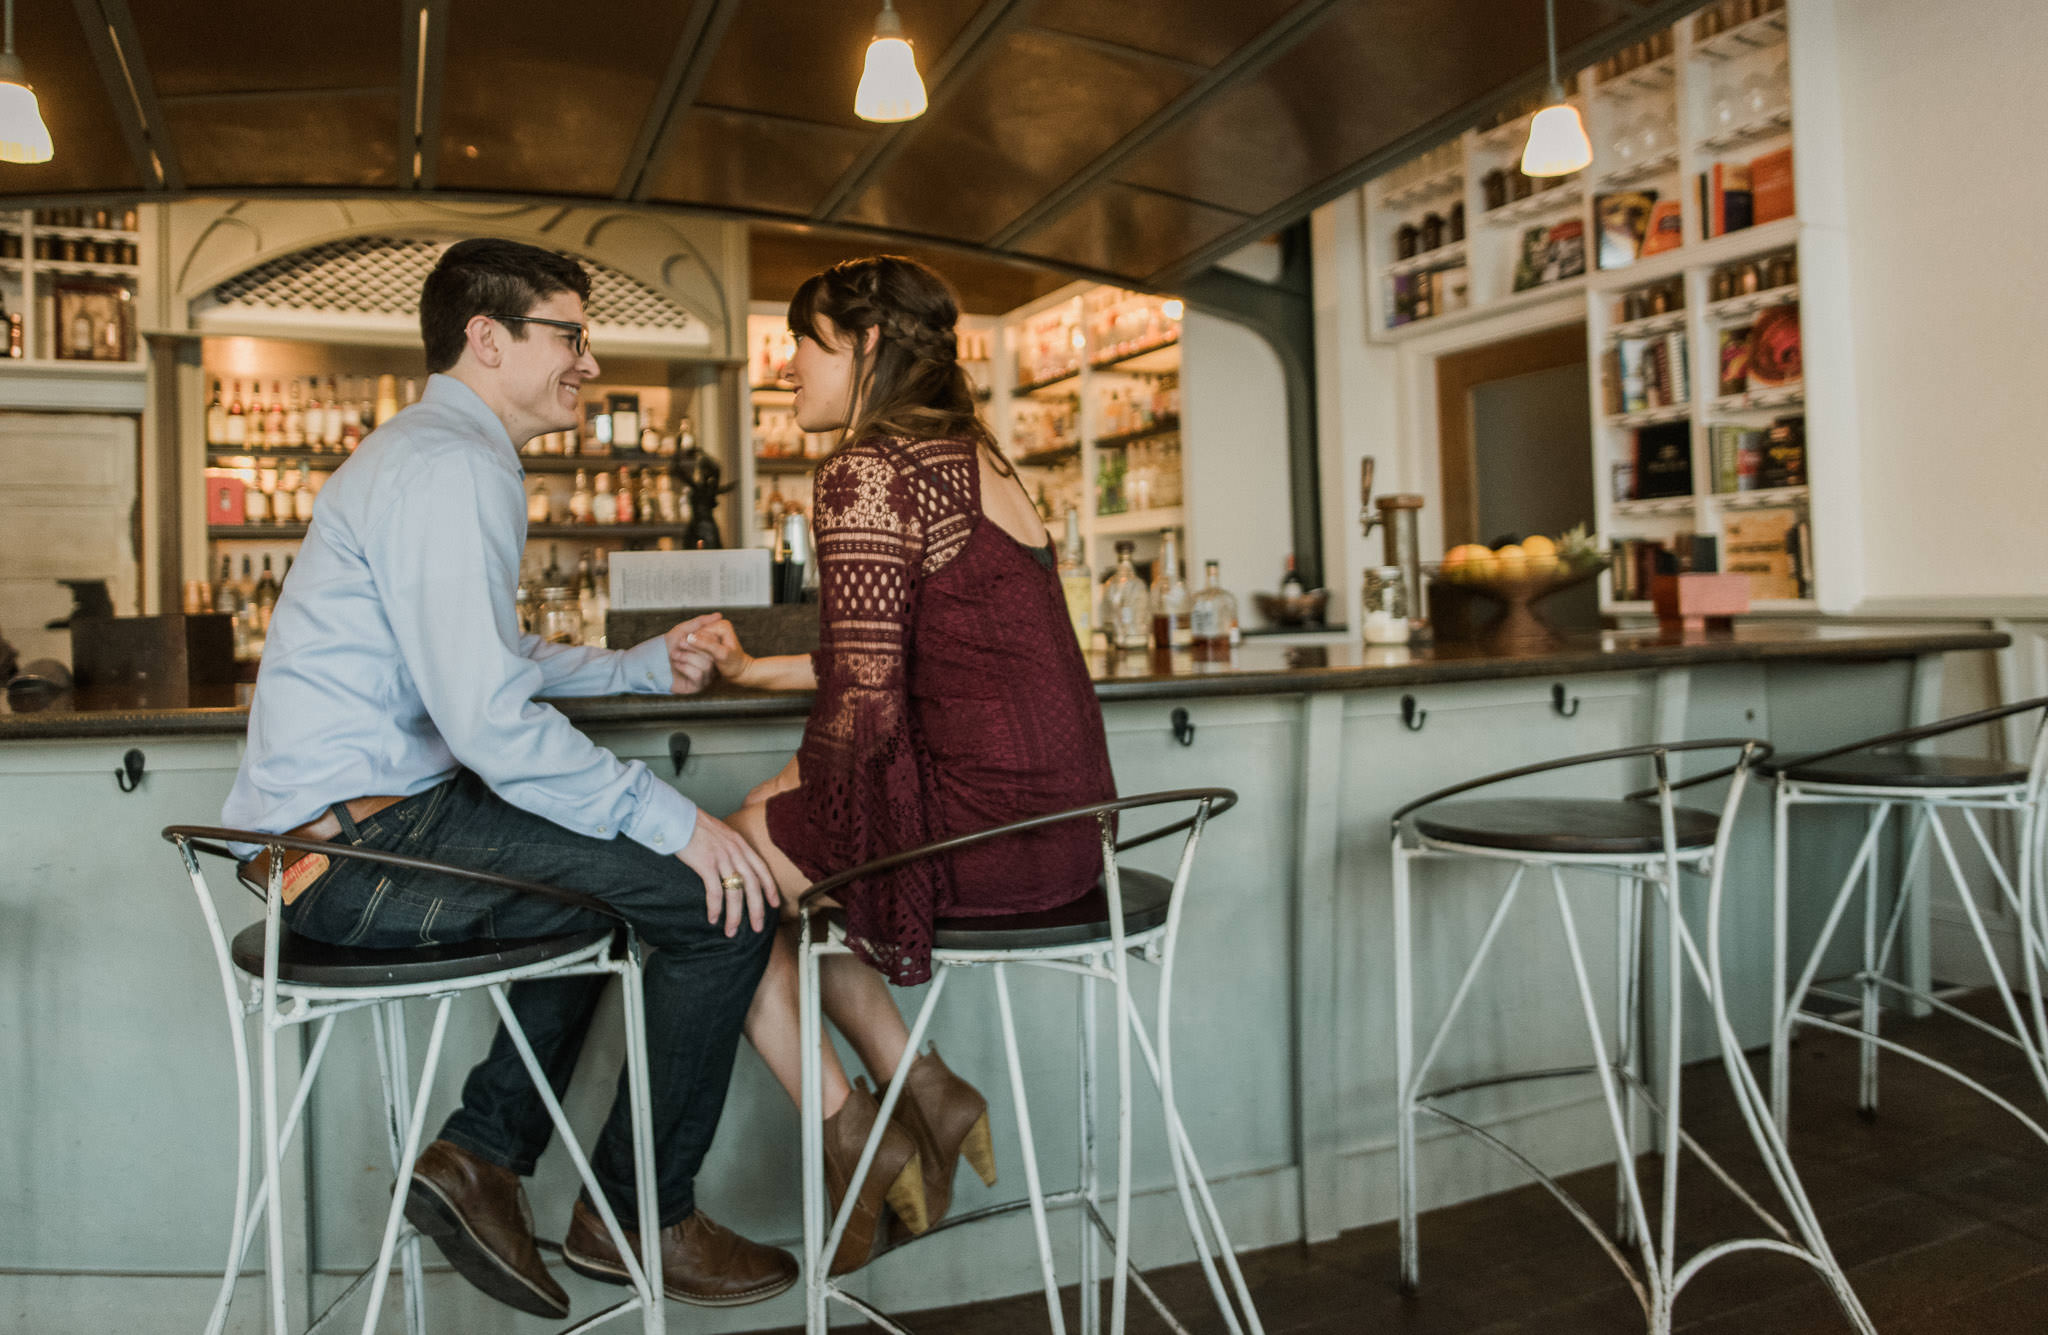 katie-joe-hughes-manor-engagement-julep-bar-cocktail-sm-27.jpg